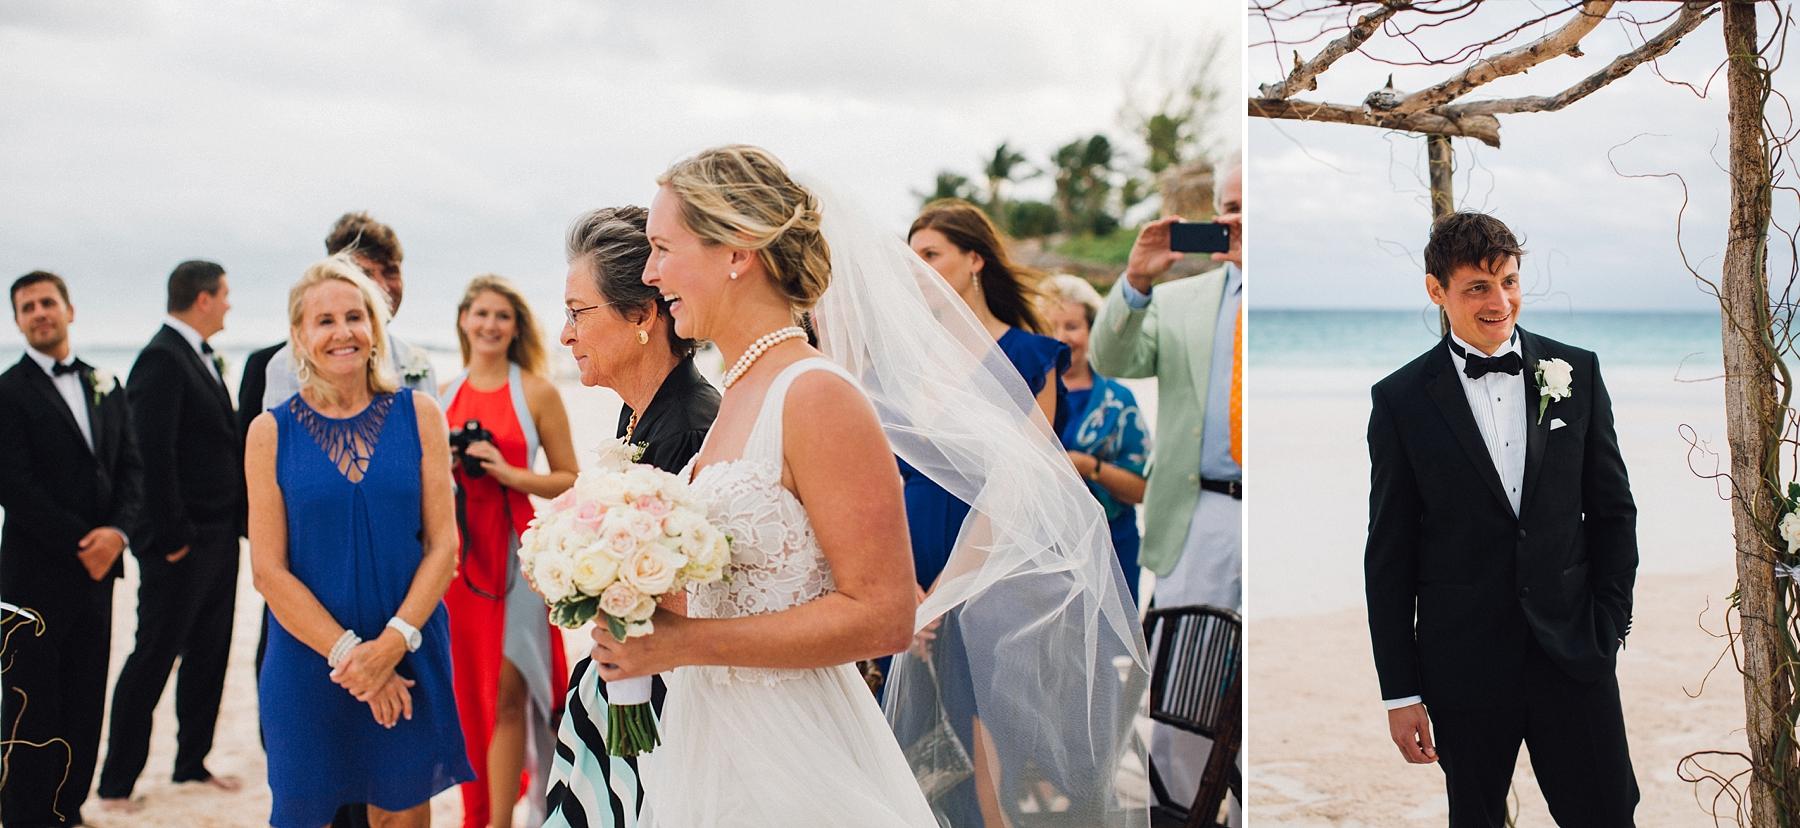 intimate-destination-wedding-beach-moments-harbour-island_0118.jpg